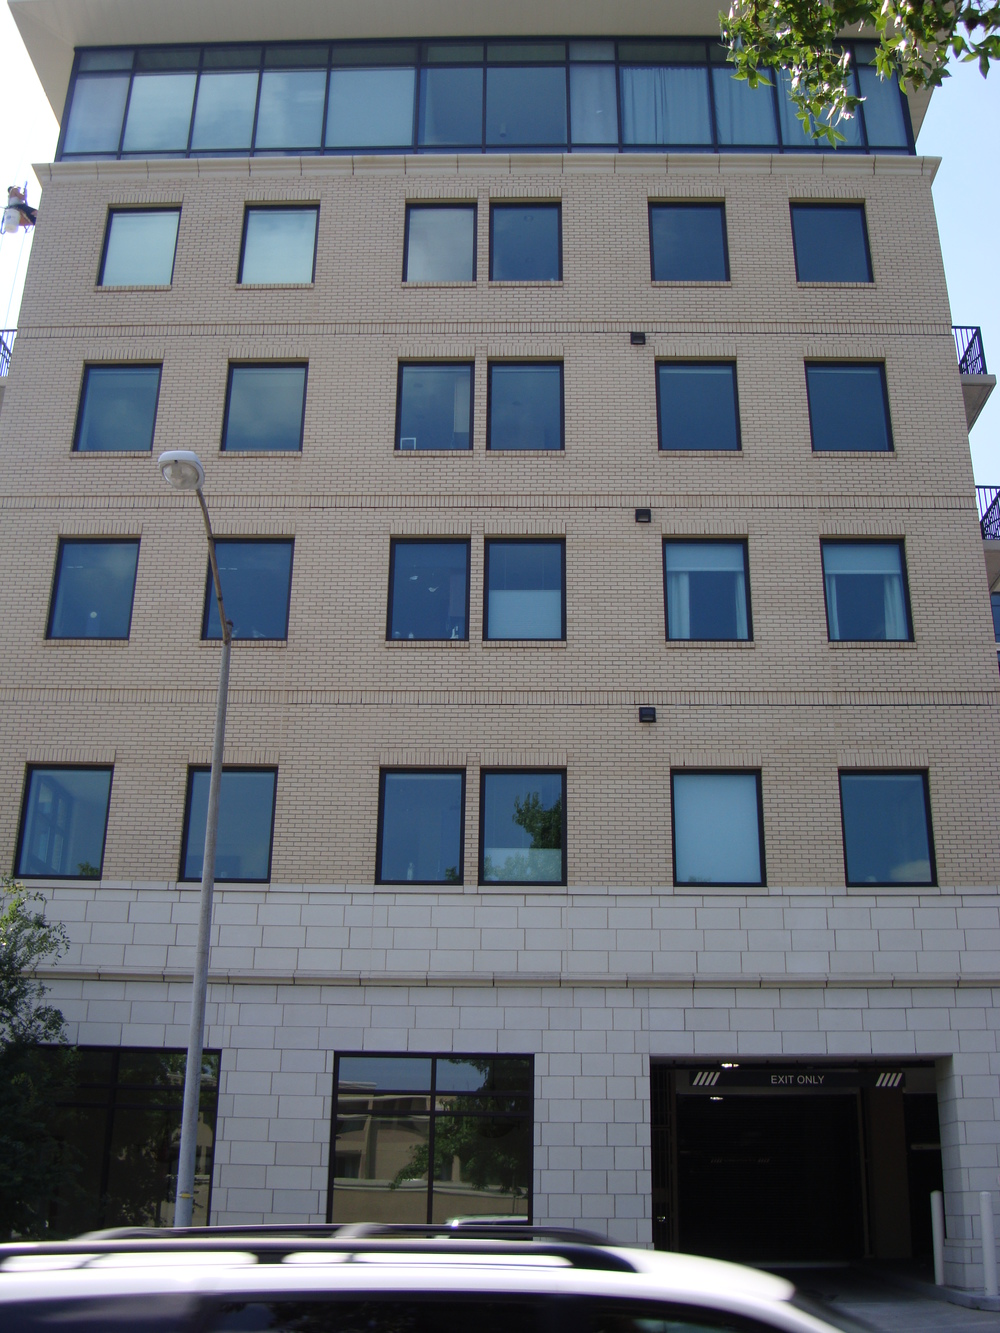 60 N. Market Street Condominiums